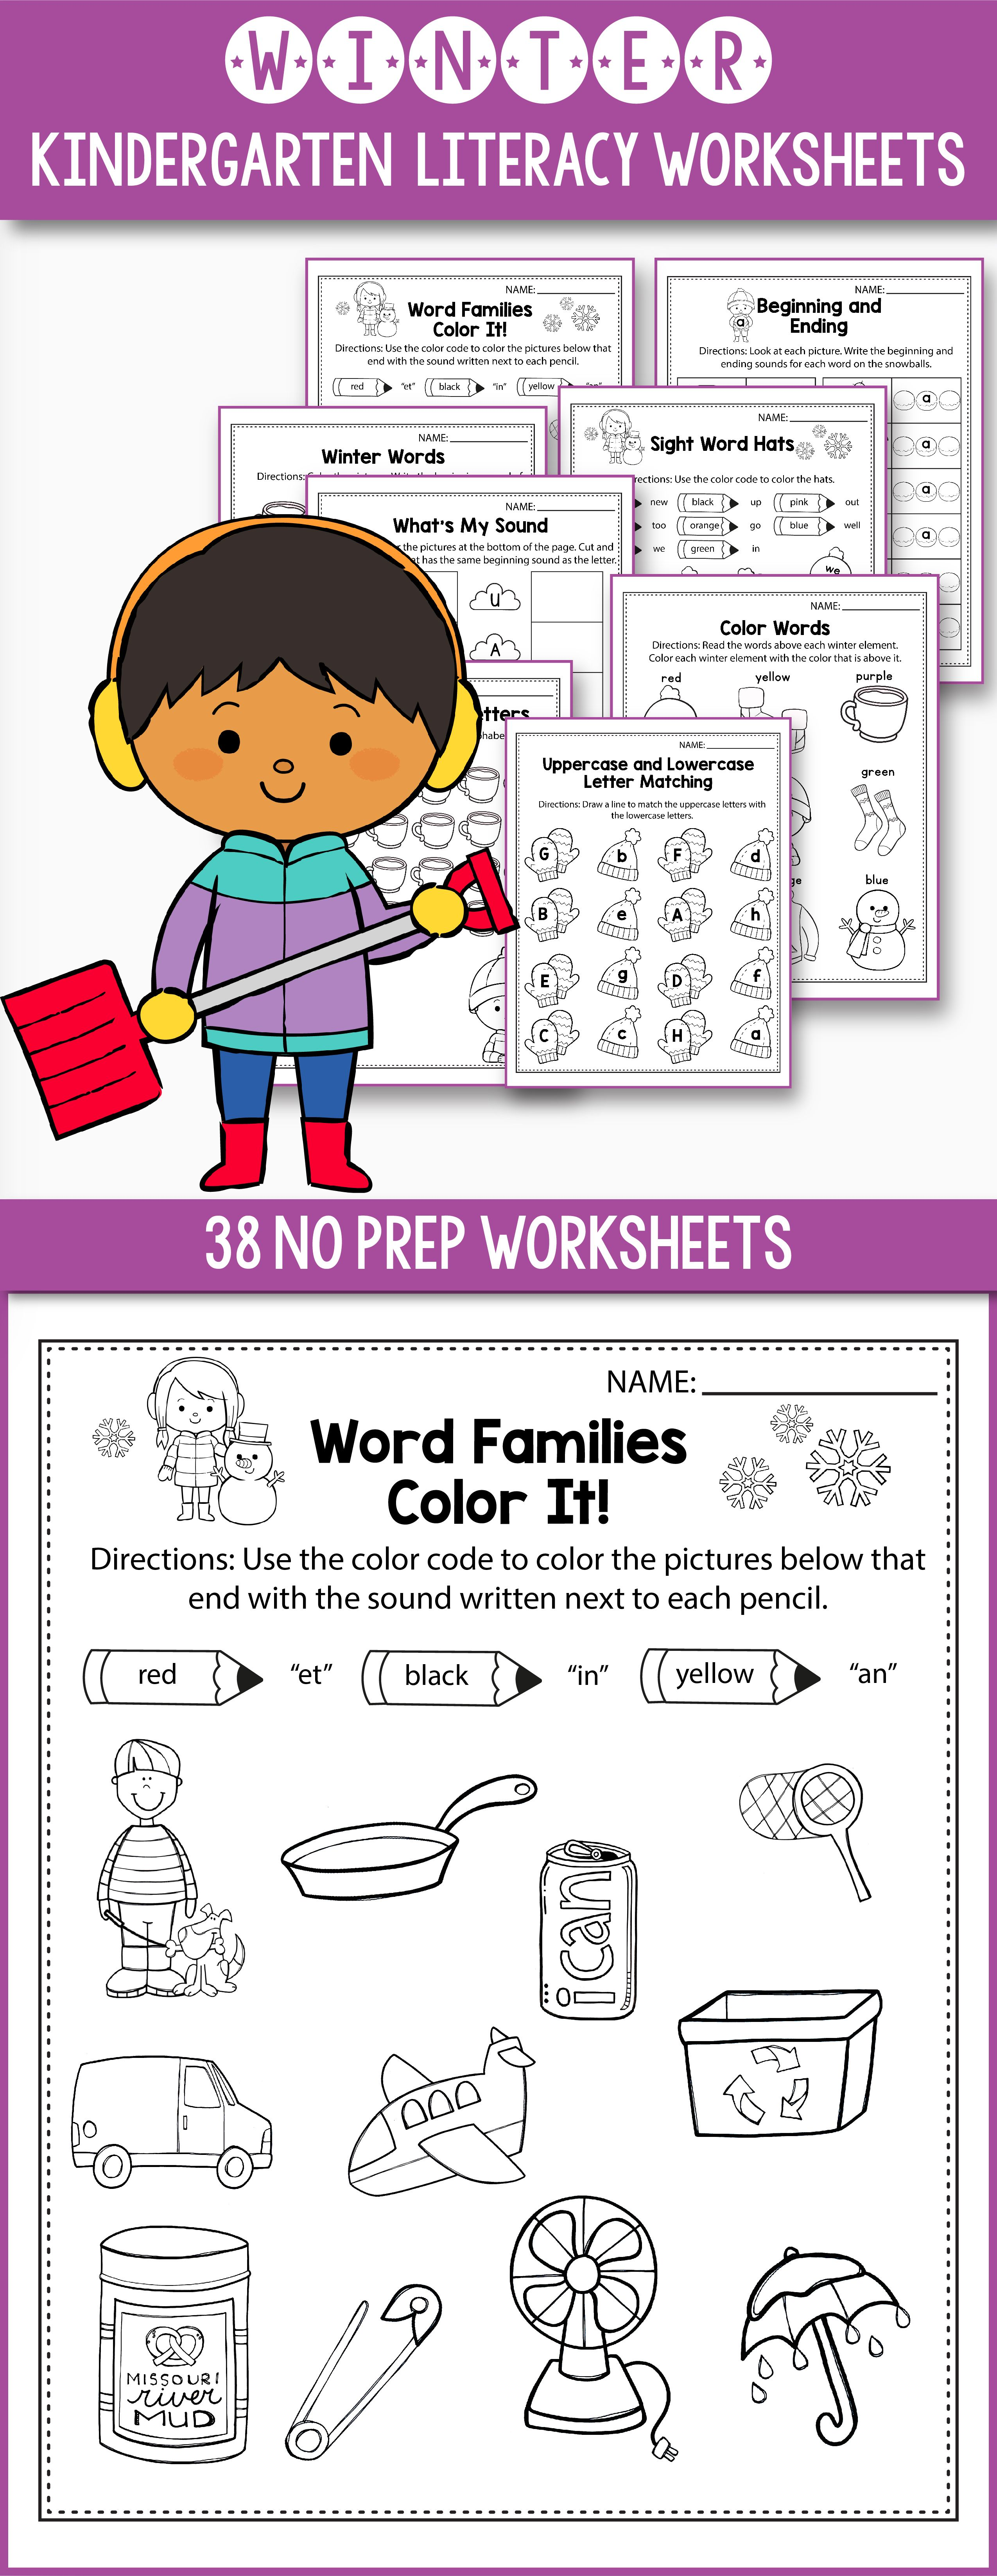 worksheet Cvc Word Worksheets winter activities for kindergarten literacy no prep novemberfun printable worksheets and first grade color by cvc word